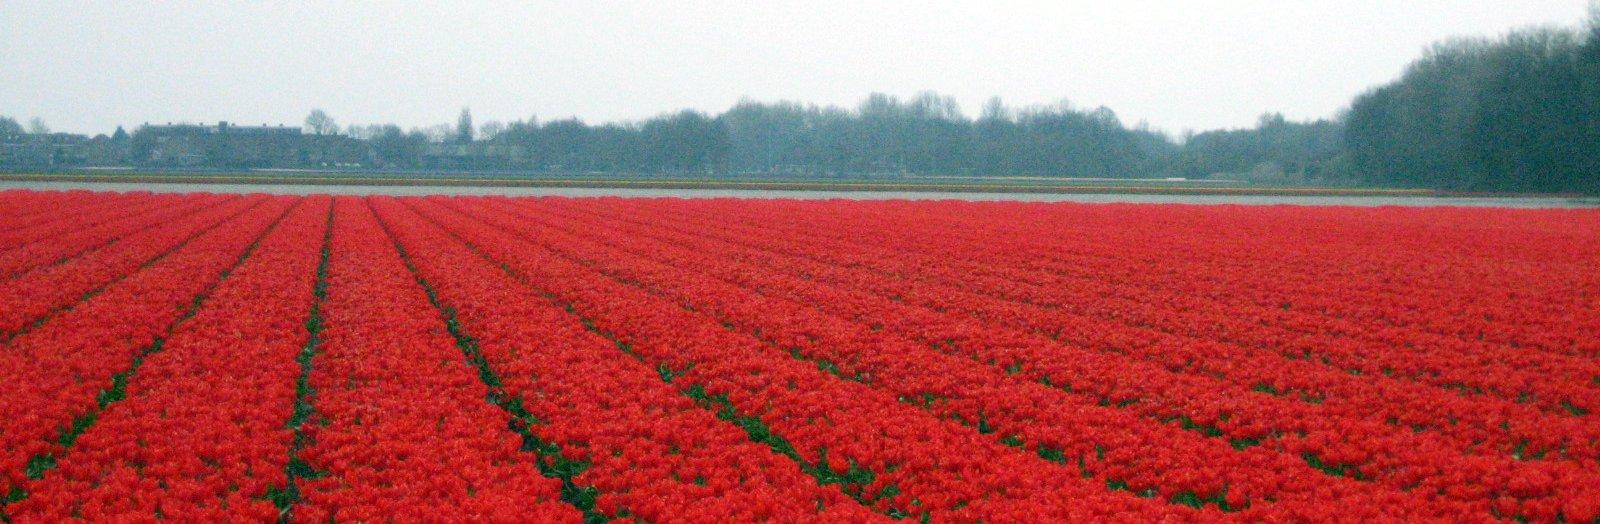 File:Veld met rode tulpen.jpeg - Wikimedia Commons